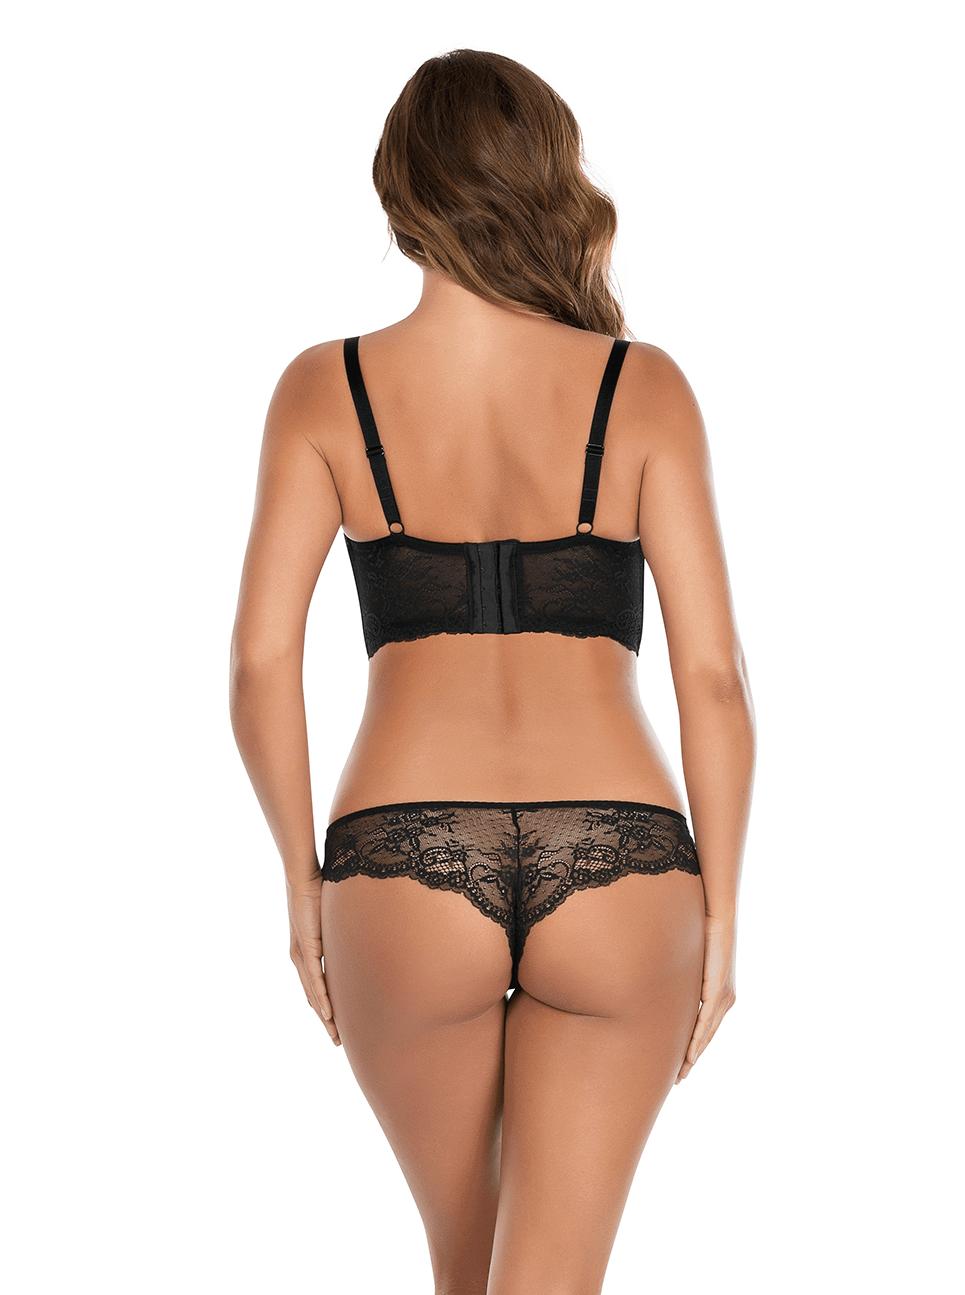 Sandrine PlungeLonglineBraP5351 BrazilianThongP5354 Black Back - Sandrine Brazilian Thong - Black - P5354